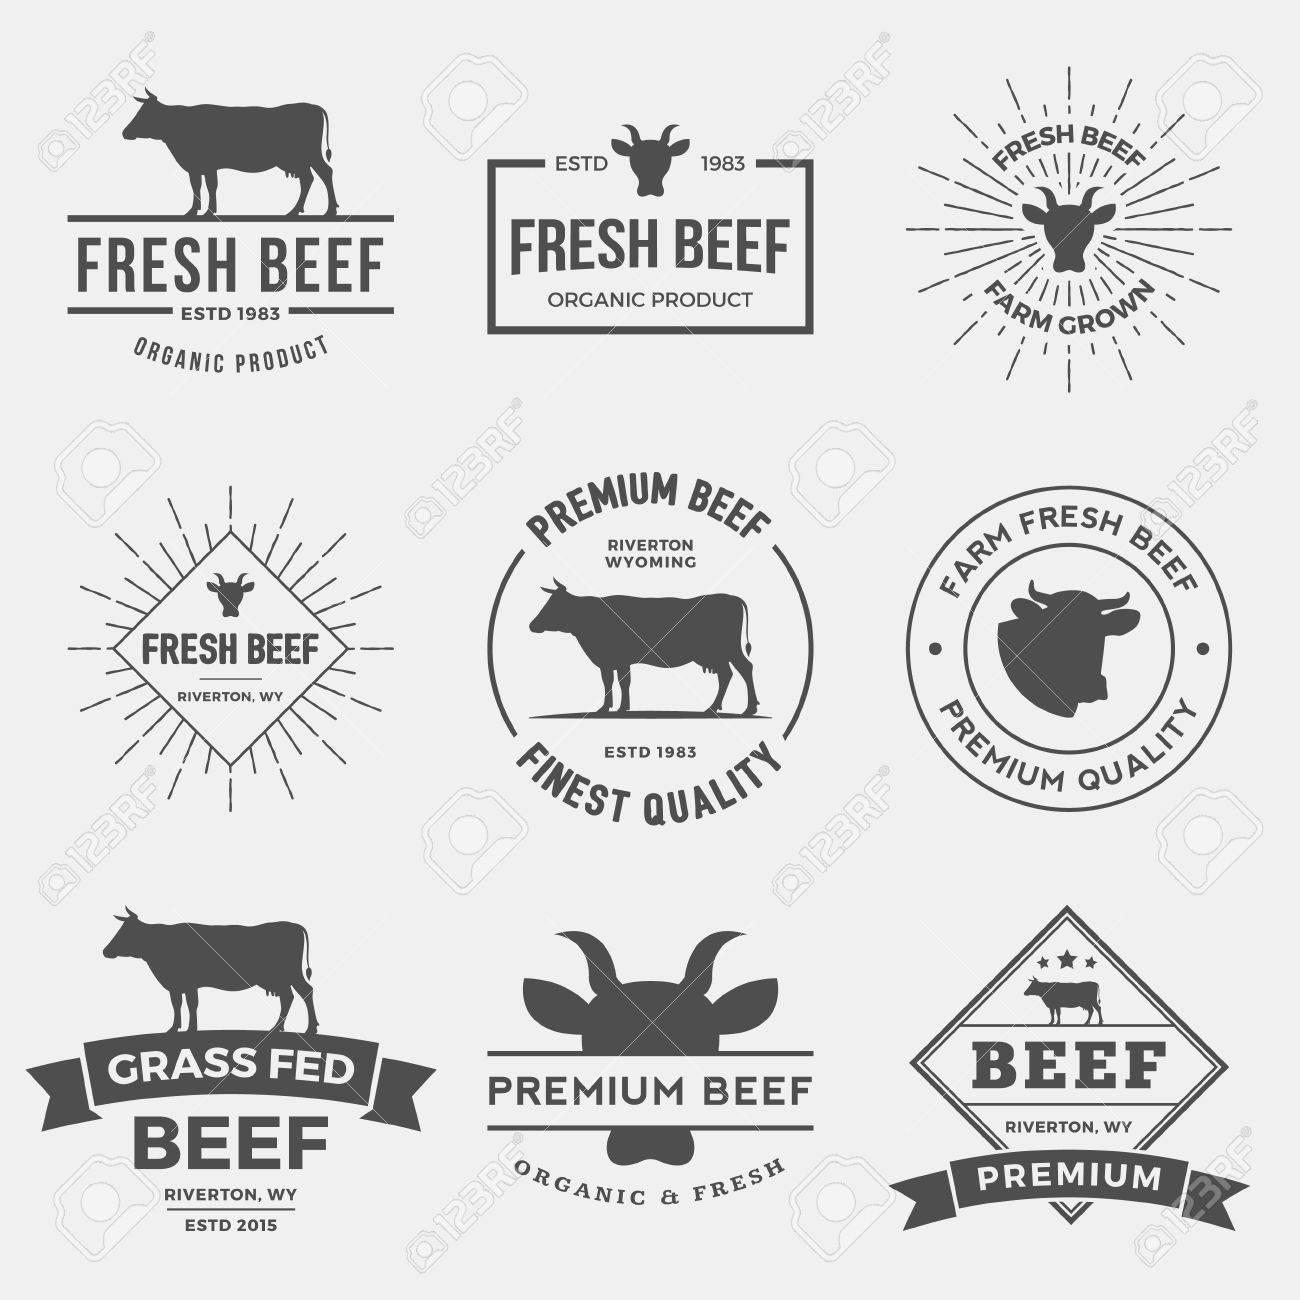 vector set of premium beef labels, badges and design elements. - 42861958